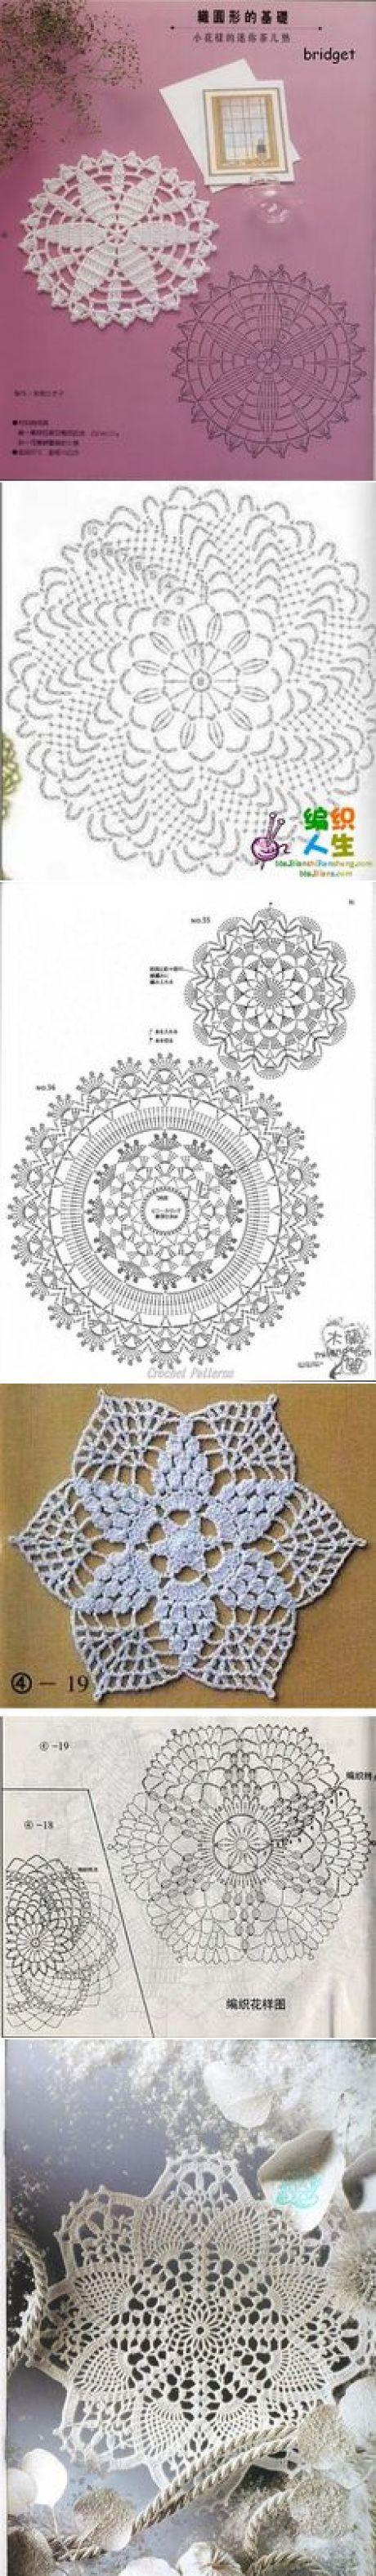 (68) Crochet doilies | Crochet: Doilies,Tablerunners and Tablecloths | Связаные Крючком Салфетки, Doilies и Вязаные Крючком Подставки Под Чашки